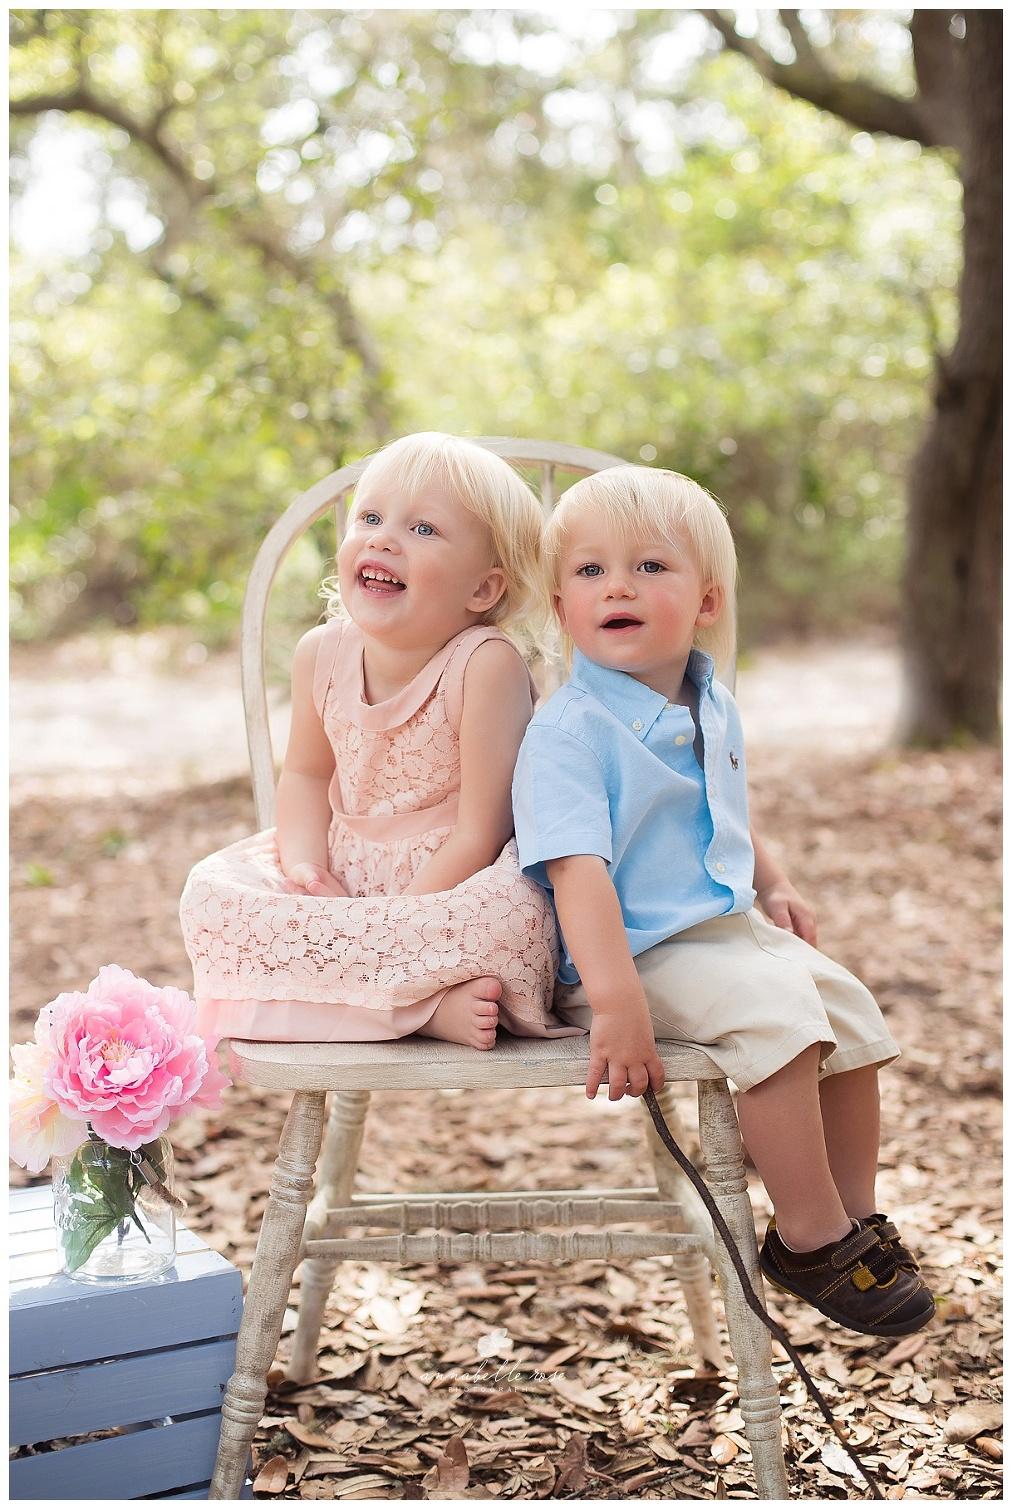 Childrens Photographer Pensacola Florida, Fairhope Alabama_0003.jpg